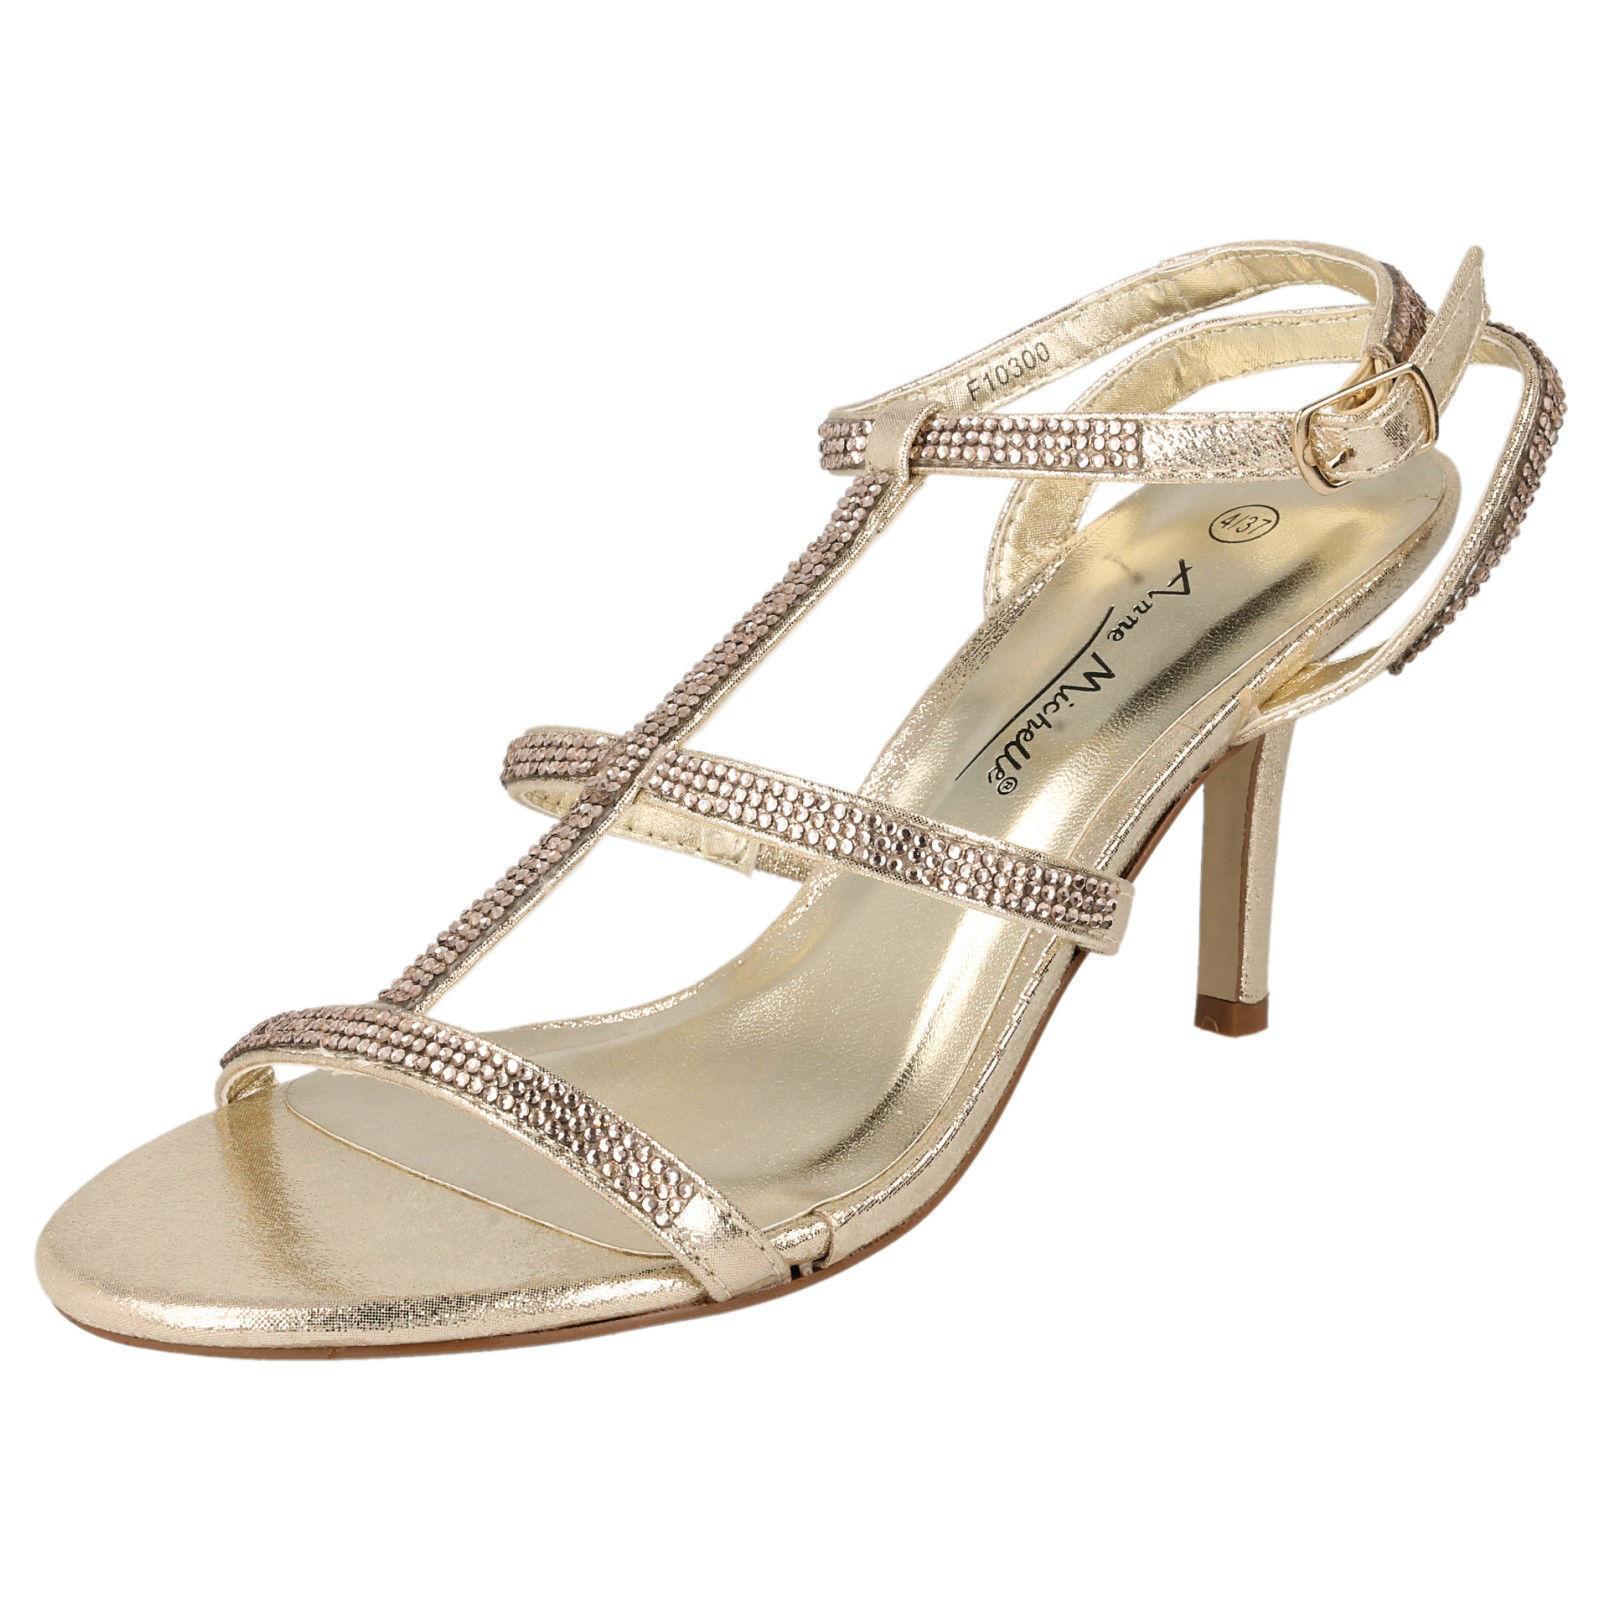 Anne Strappy Michelle Champagne Strappy Anne Diamante Sandals F10300 (R23A) 99f8af